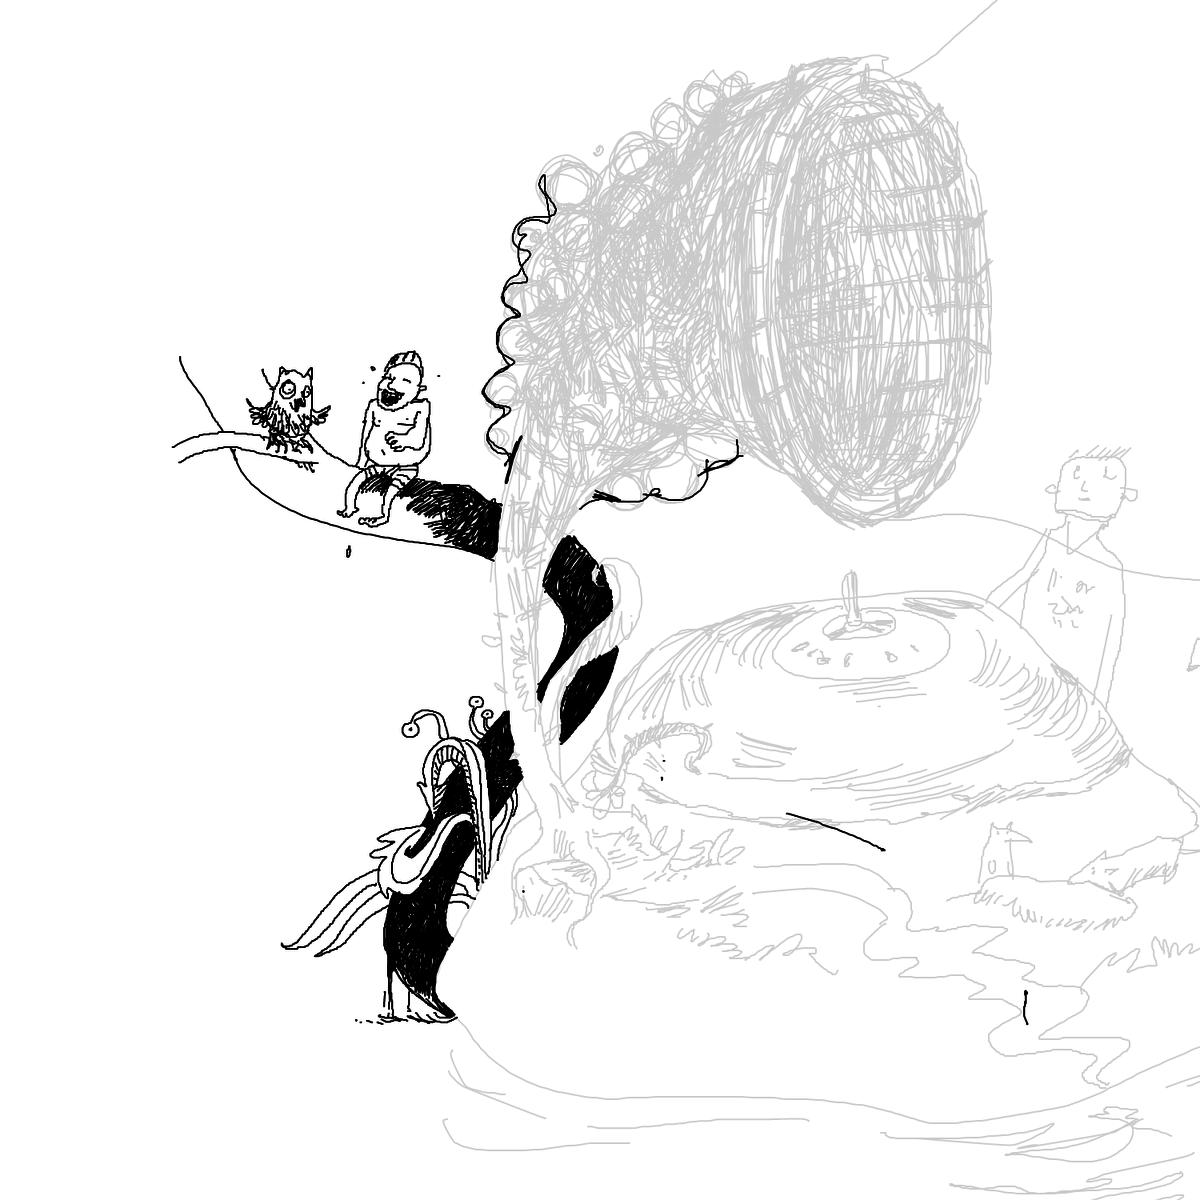 BAAAM drawing#4142 lat:78.4207687377929700lng: -4.4888372421264650